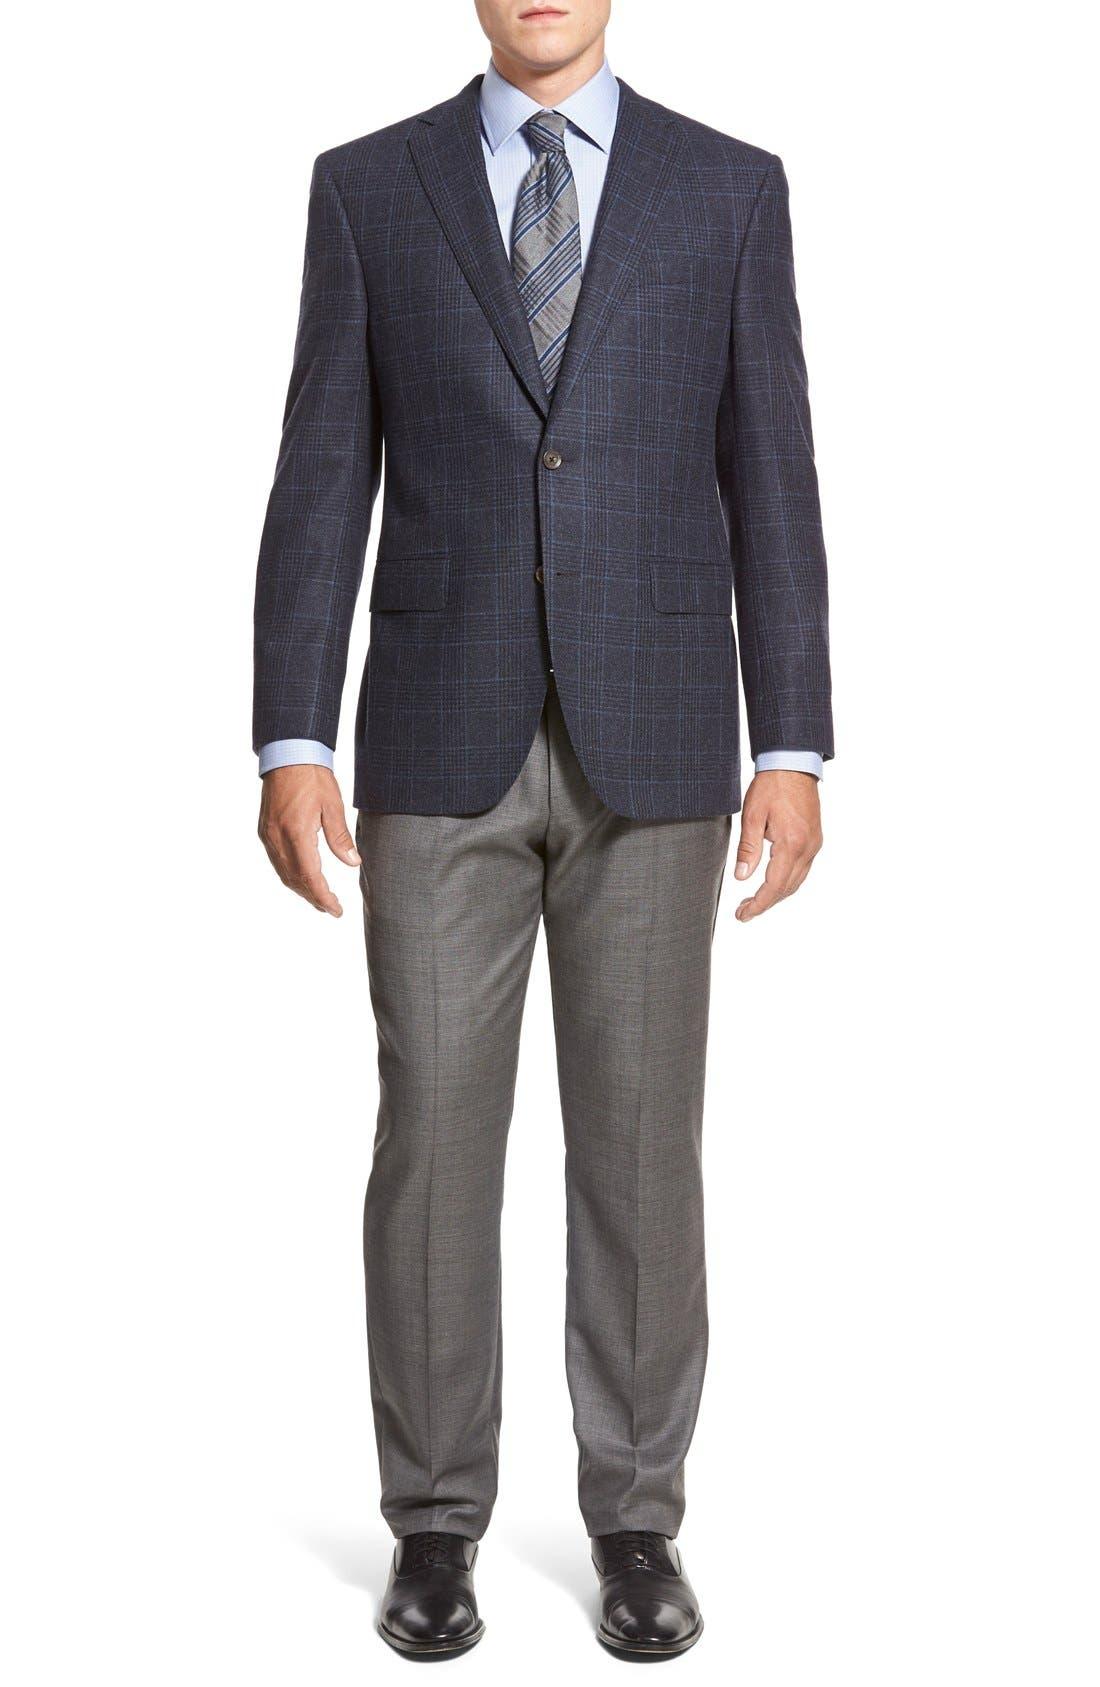 ZZDNUHUGO BOSS,                             BOSS HUGO BOSS 'Sharp' Flat Front Wool Trousers,                             Alternate thumbnail 2, color,                             001